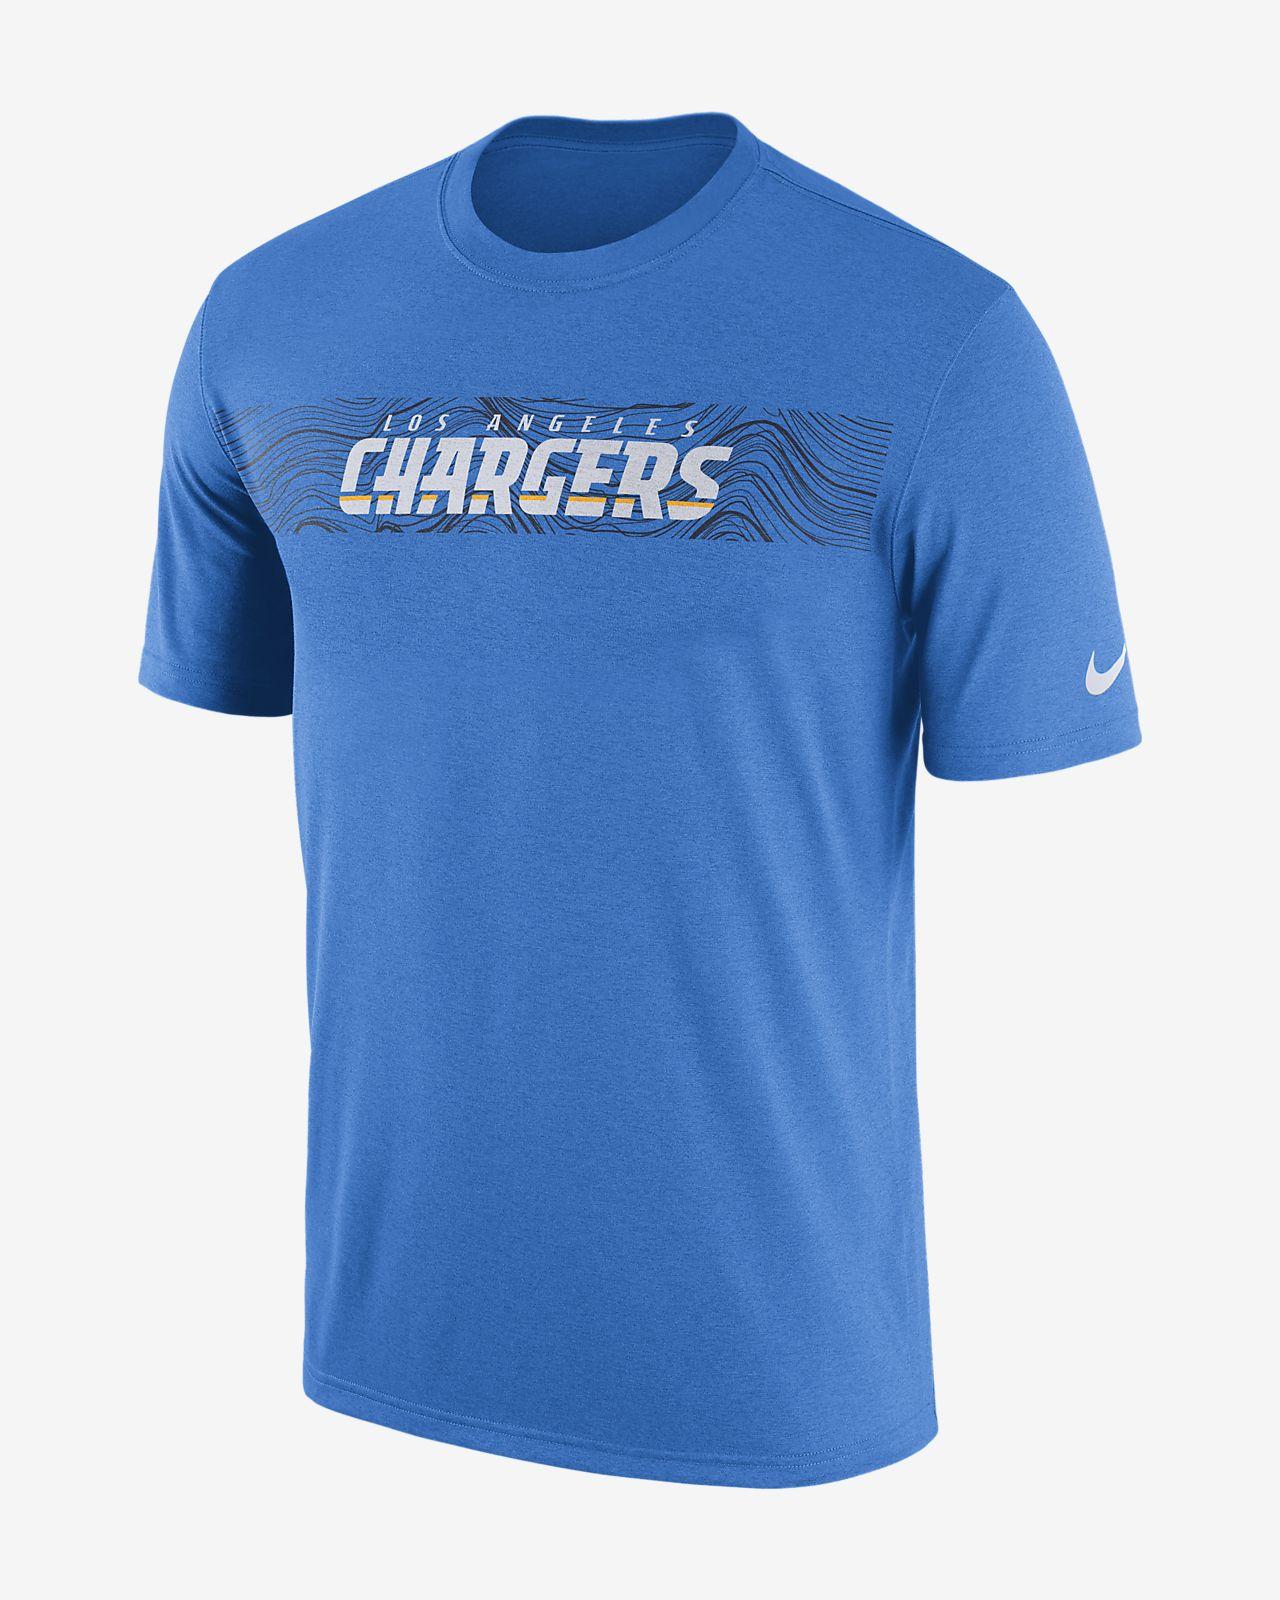 Nike Dri-FIT Legend Seismic (NFL Chargers) Erkek Tişörtü